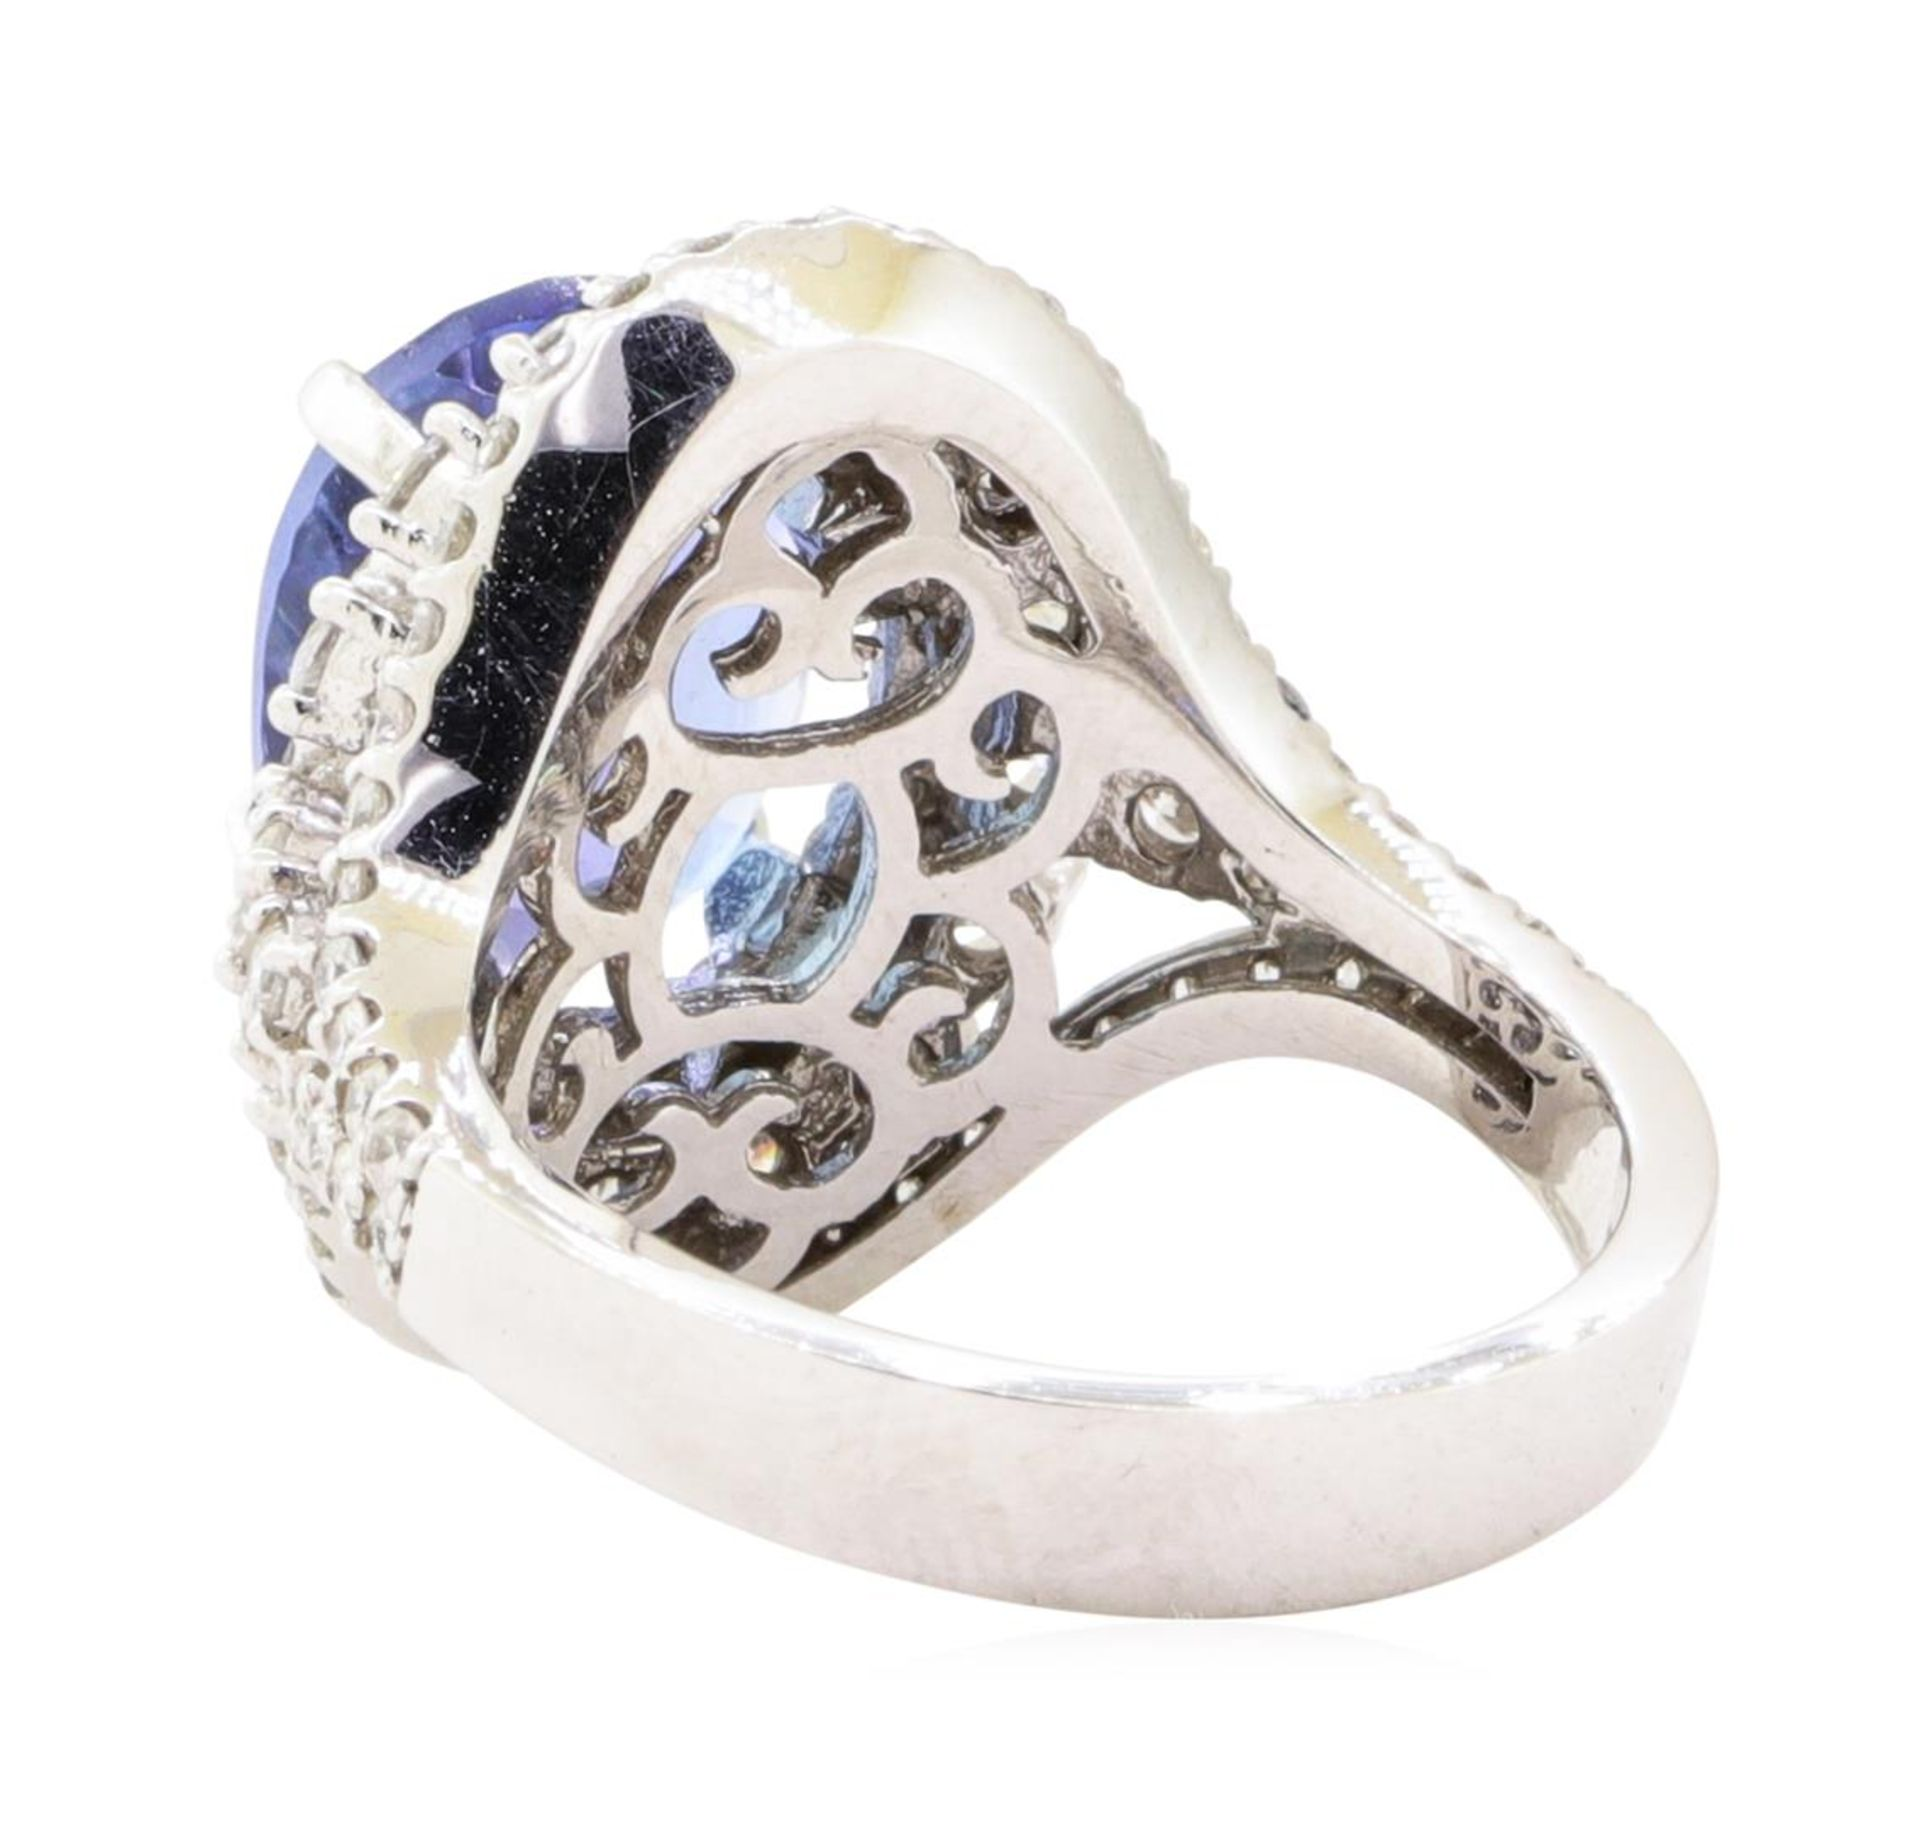 7.72 ctw Tanzanite And Diamond Ring - 14KT White Gold - Image 3 of 5